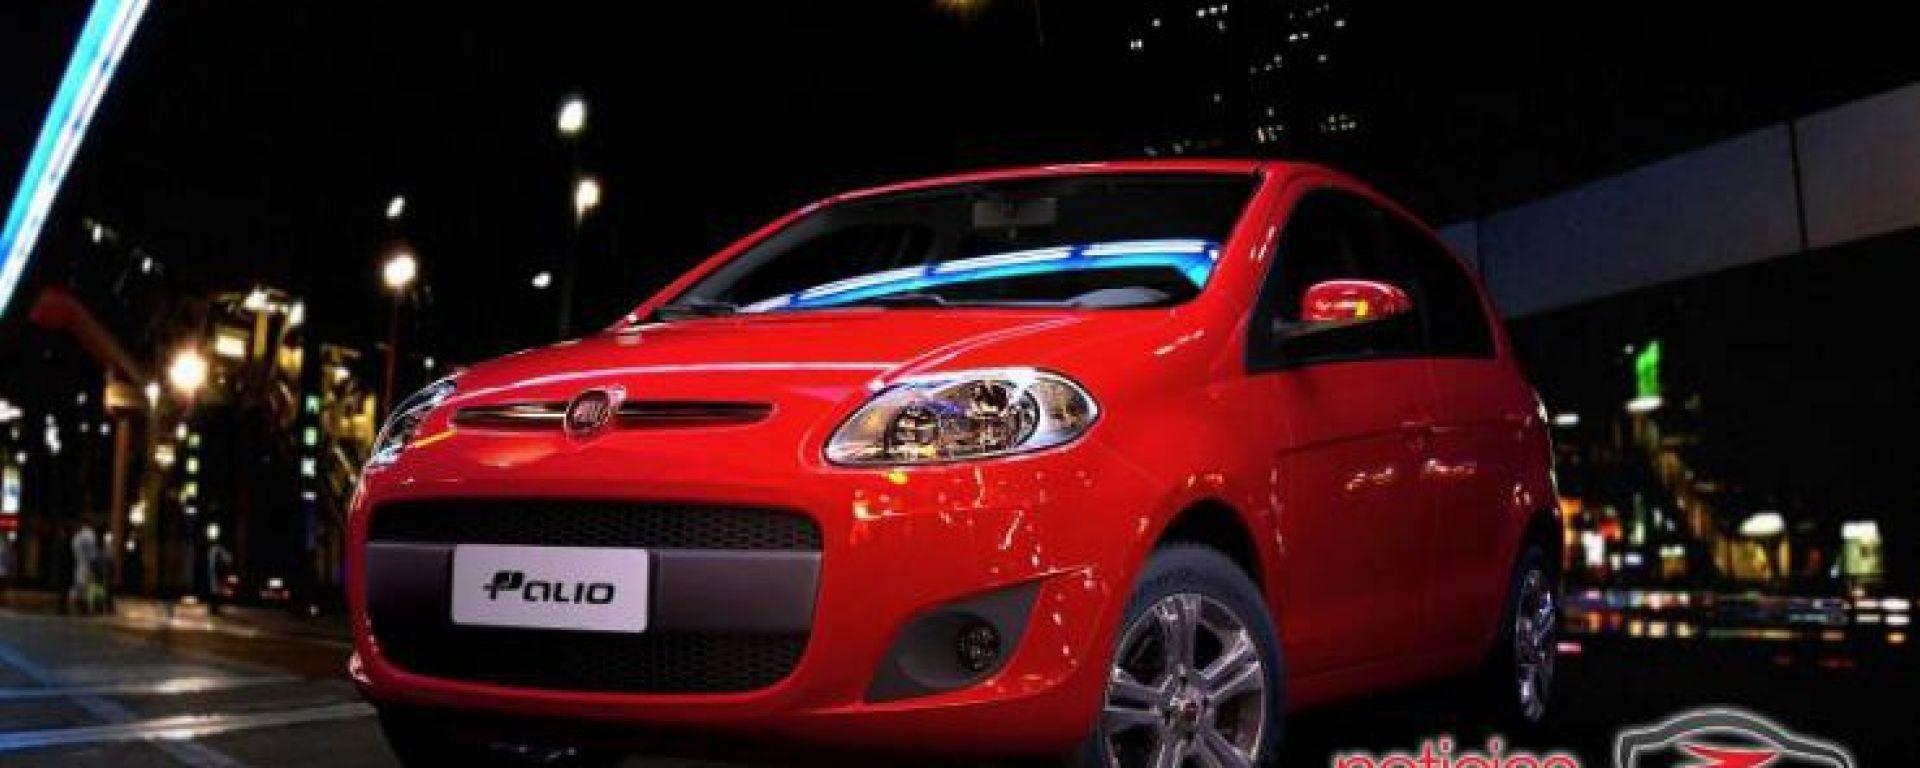 Nuova Fiat Palio